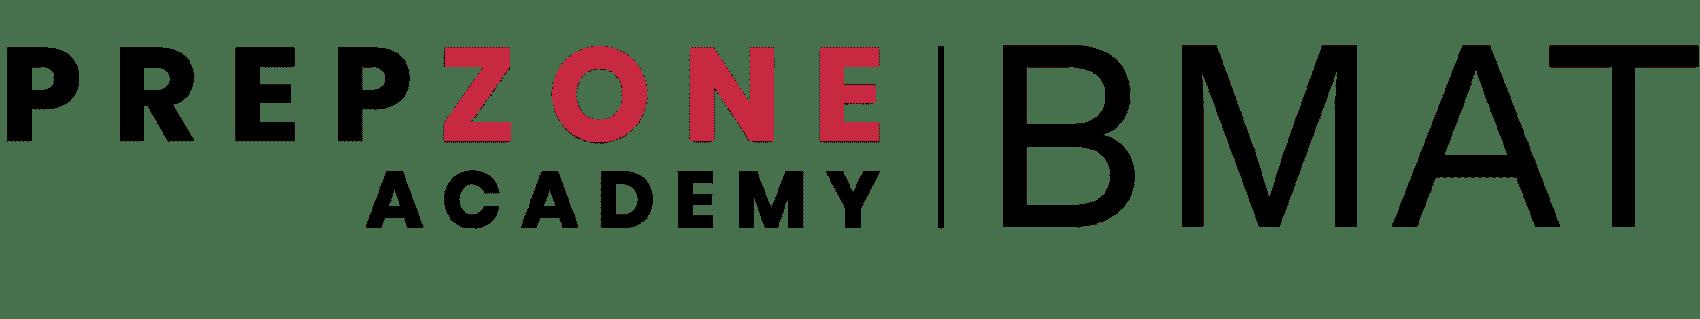 Prep Zone Academy™ | BMAT